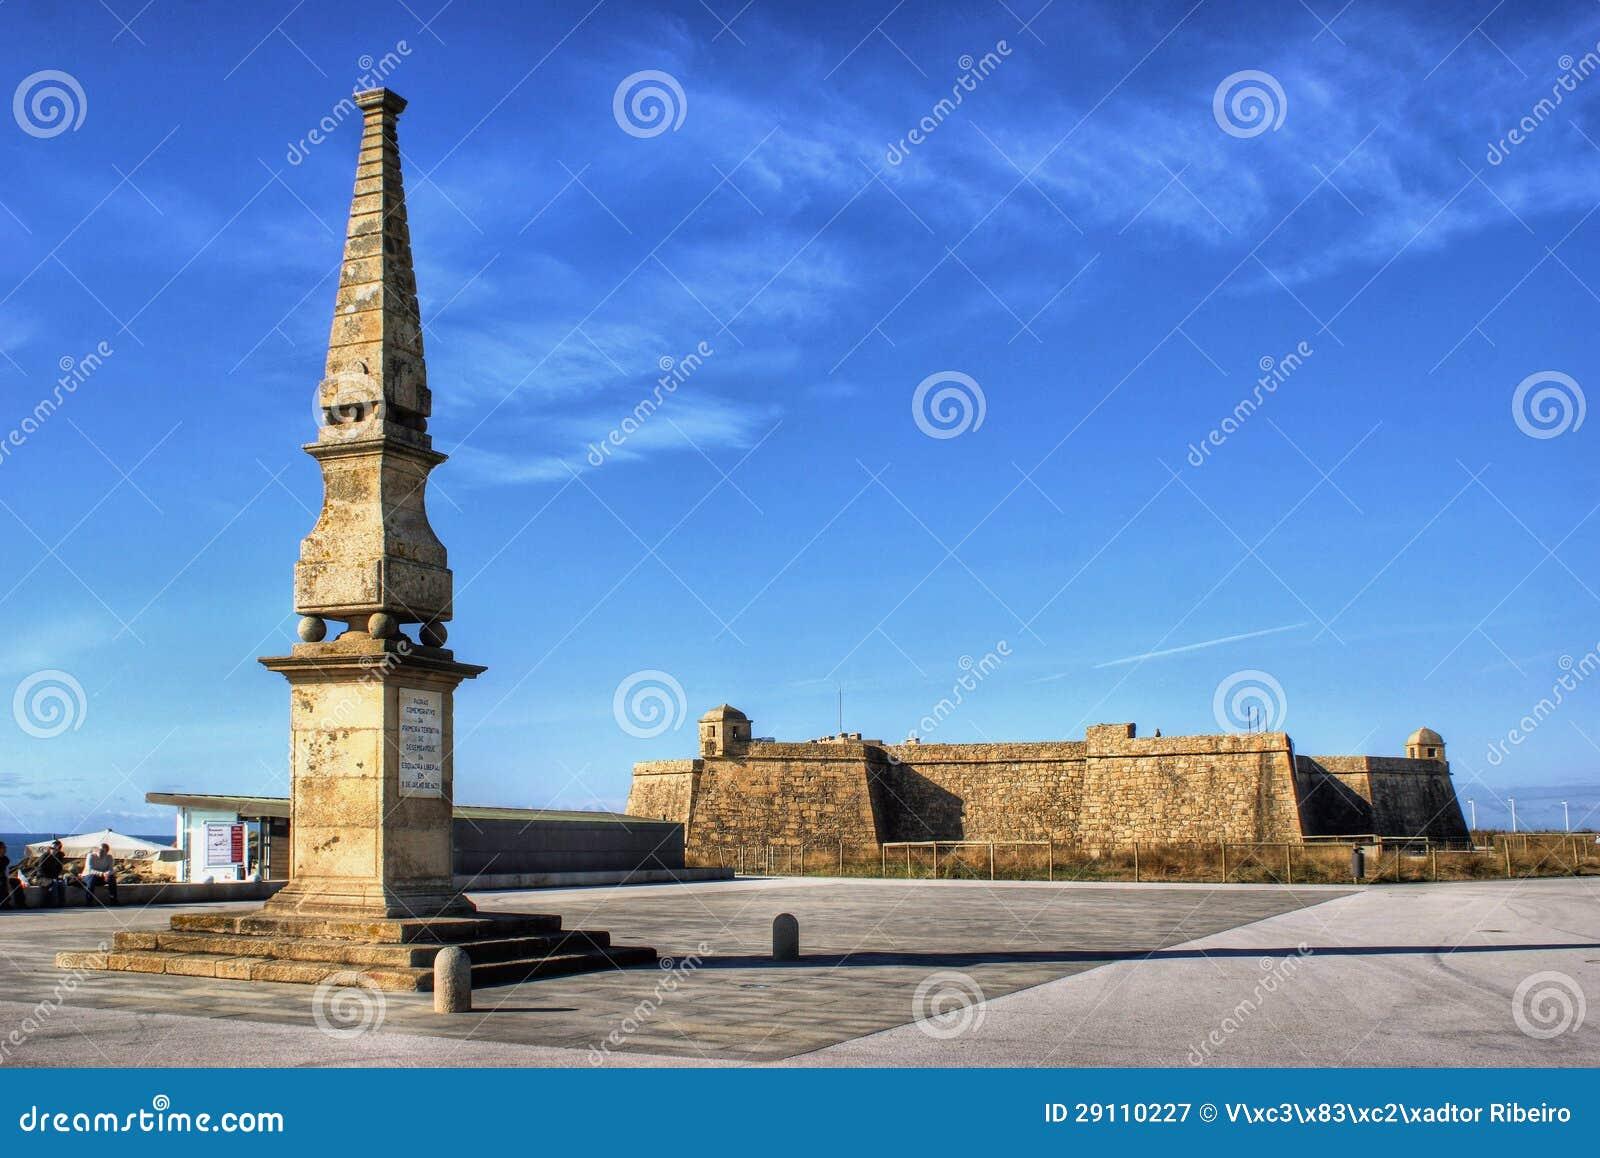 Landing Commemorative Monument in Mindelo